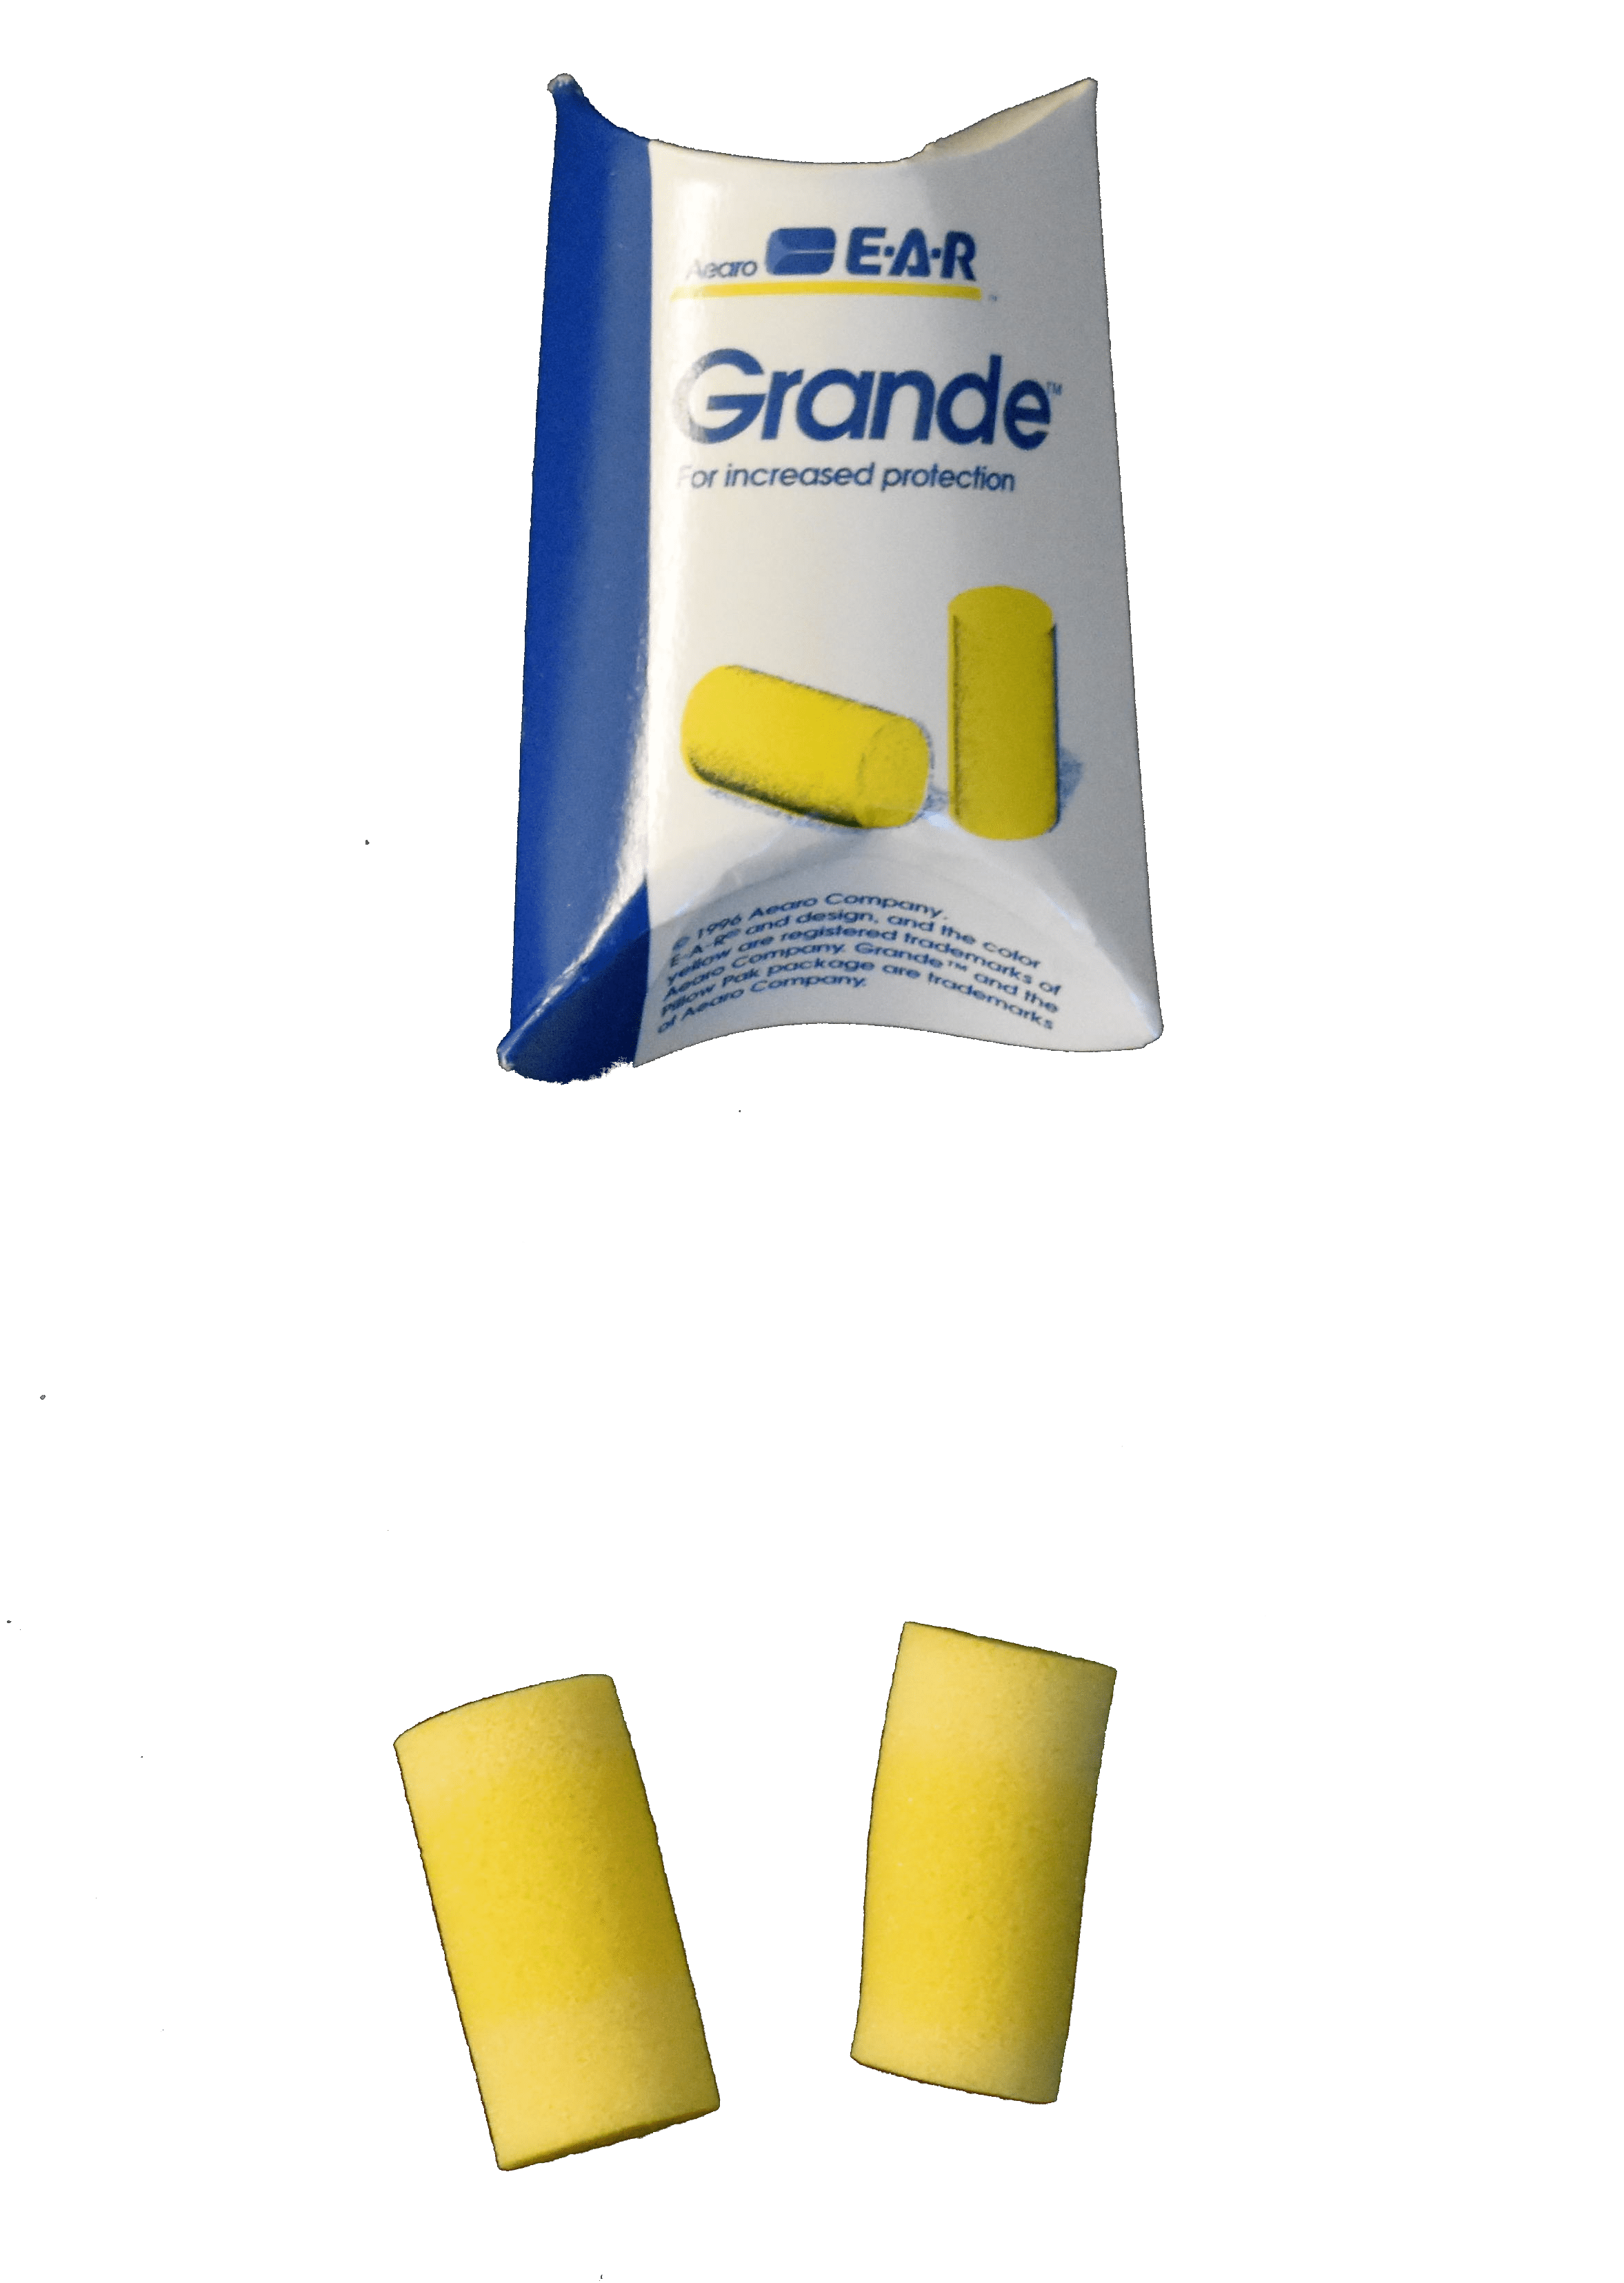 yellow plugs